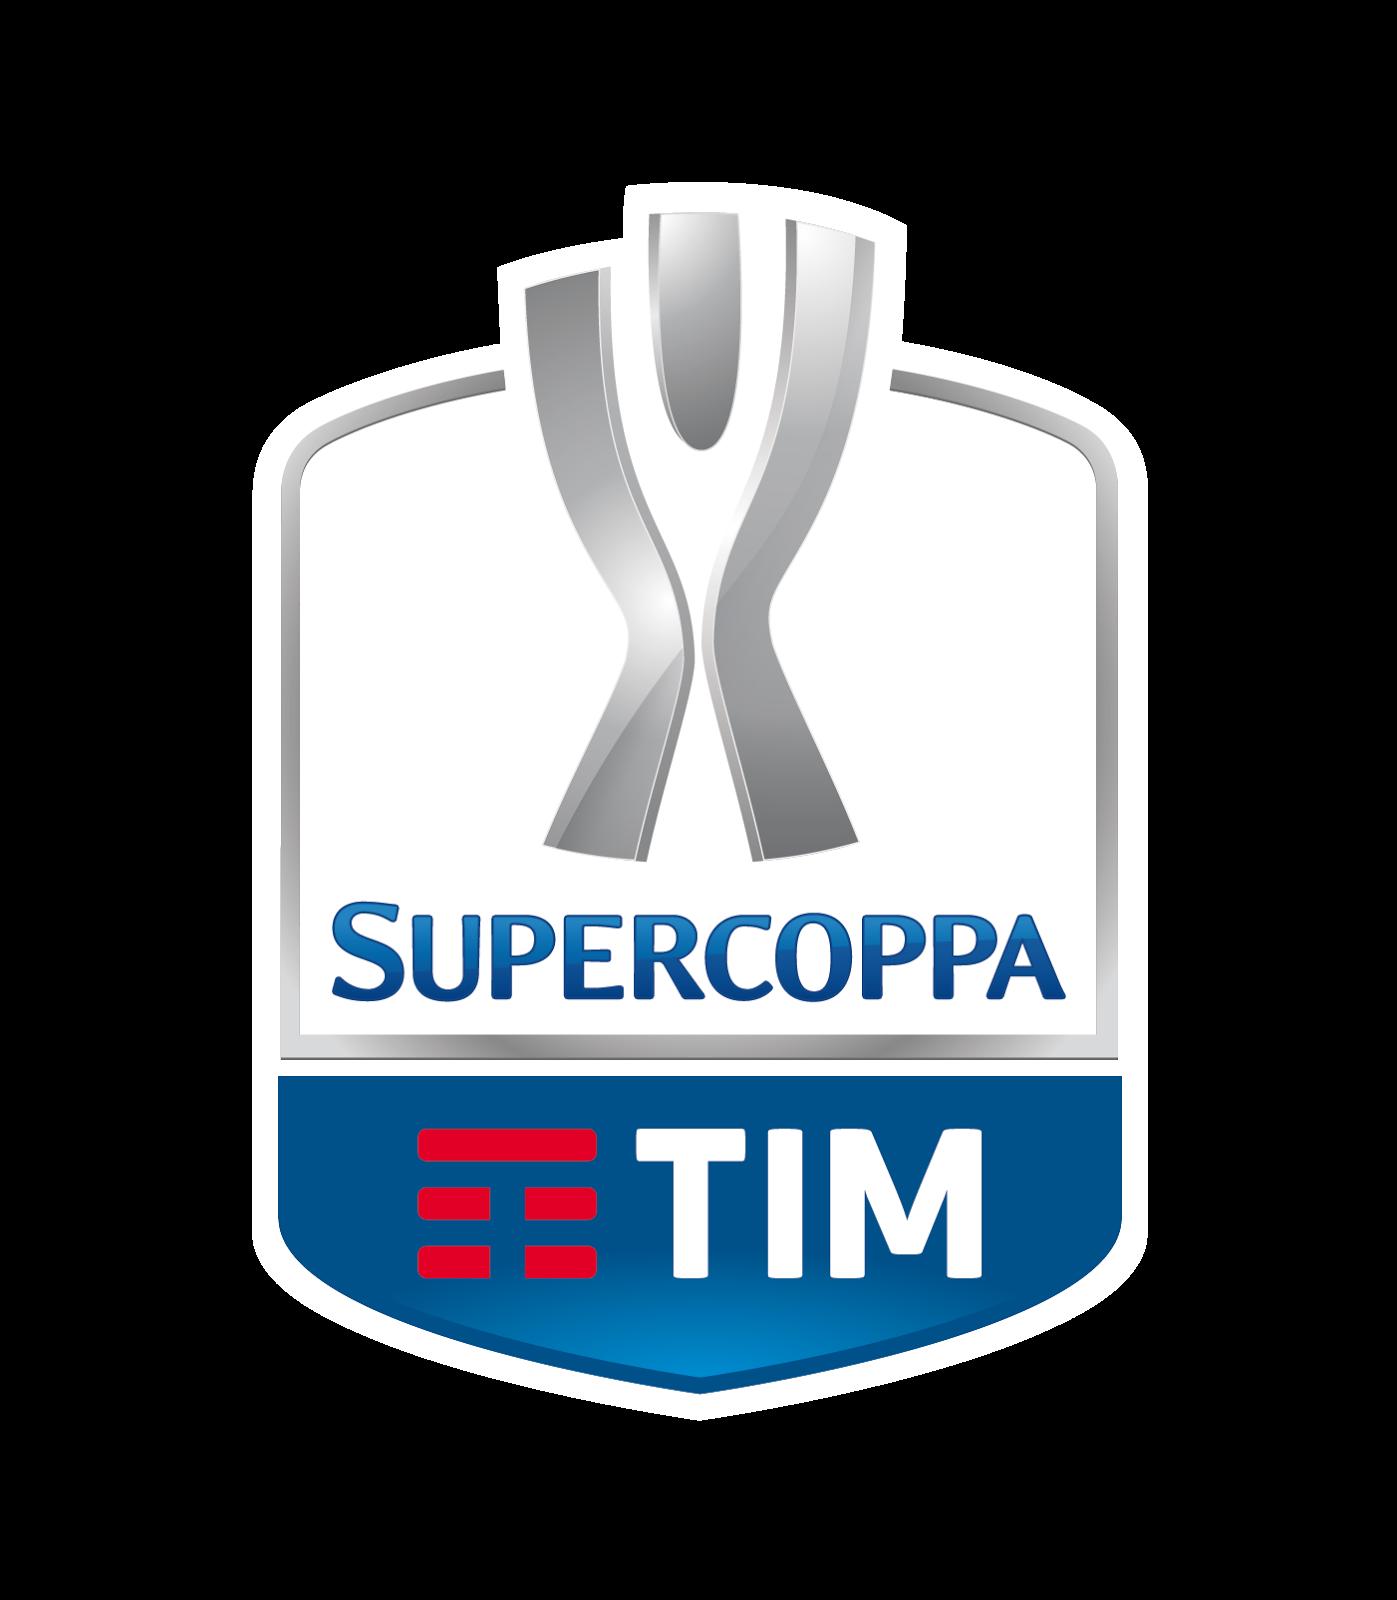 pes 2017 supercoppa tim scoreboard by gstyle season 2016